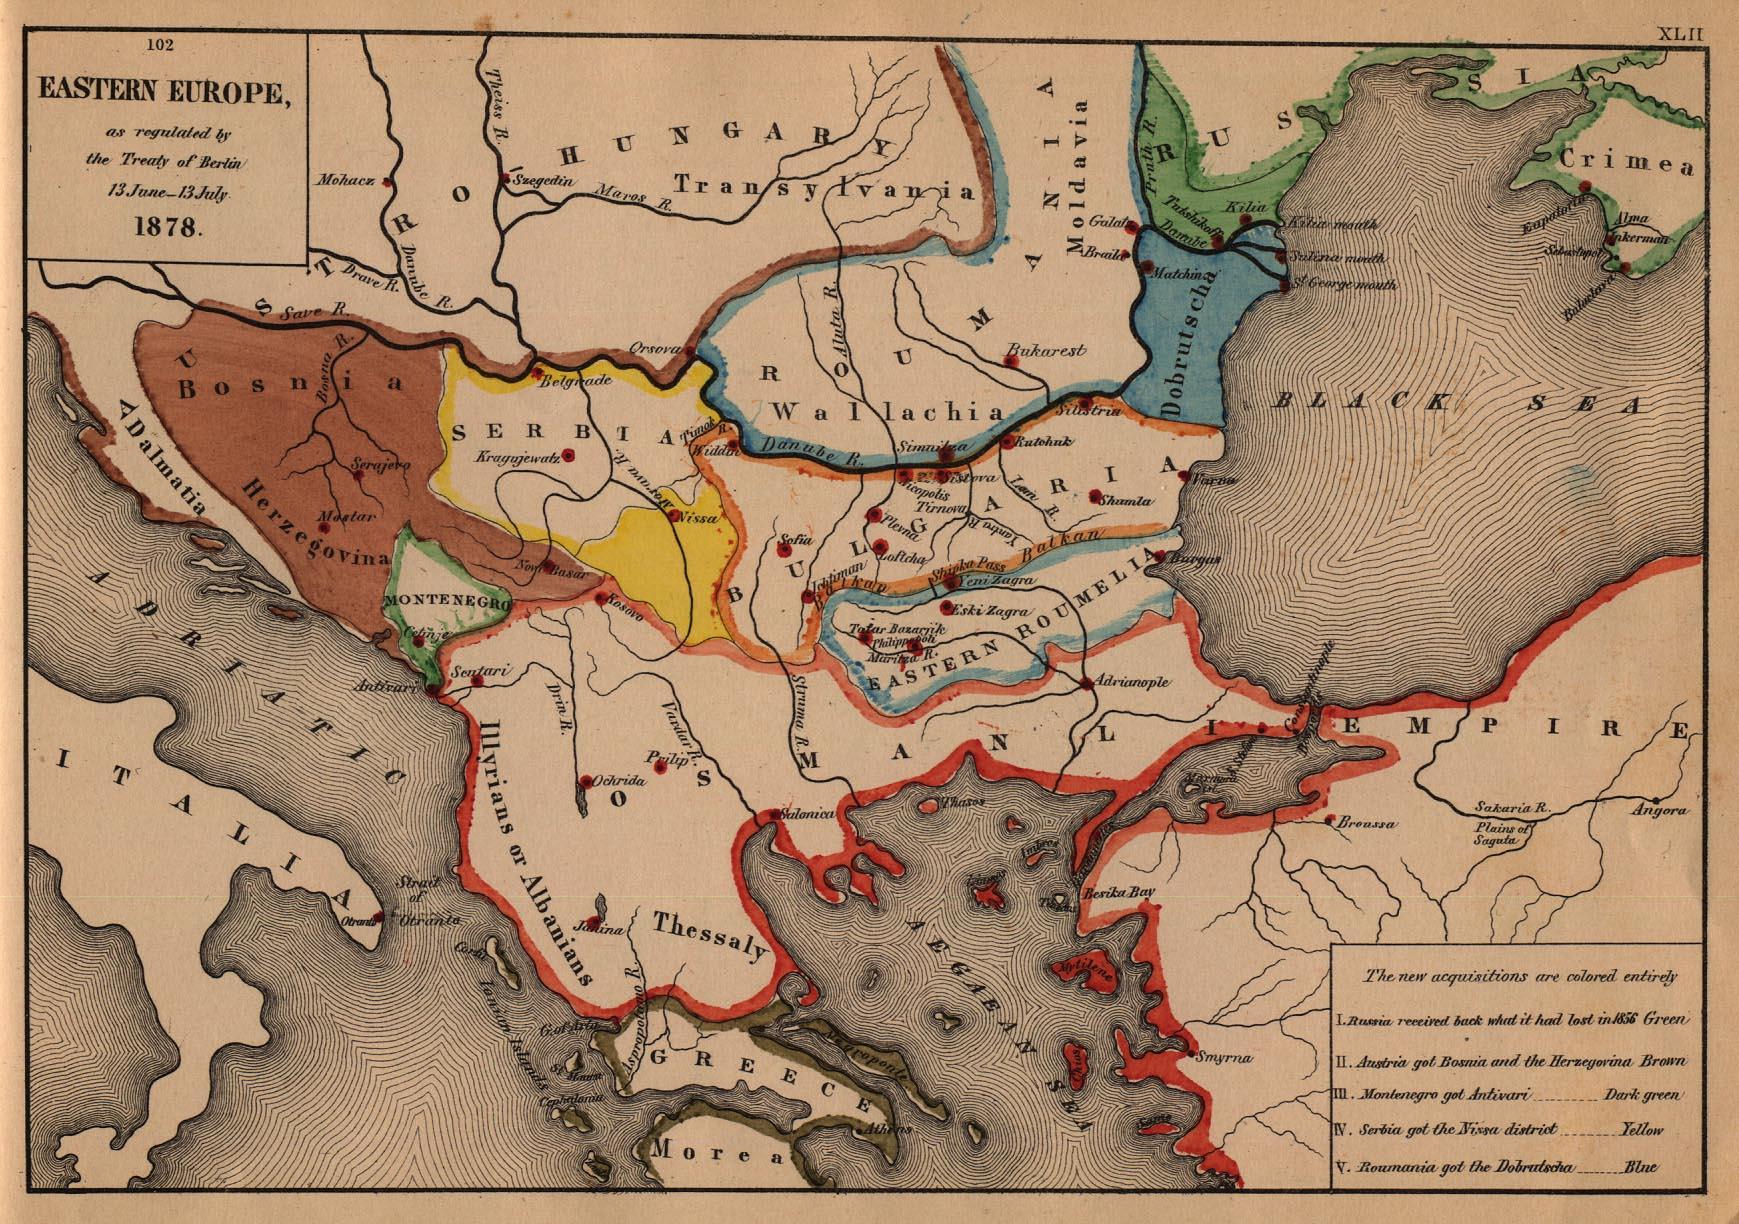 Eastern Europe Map 1878